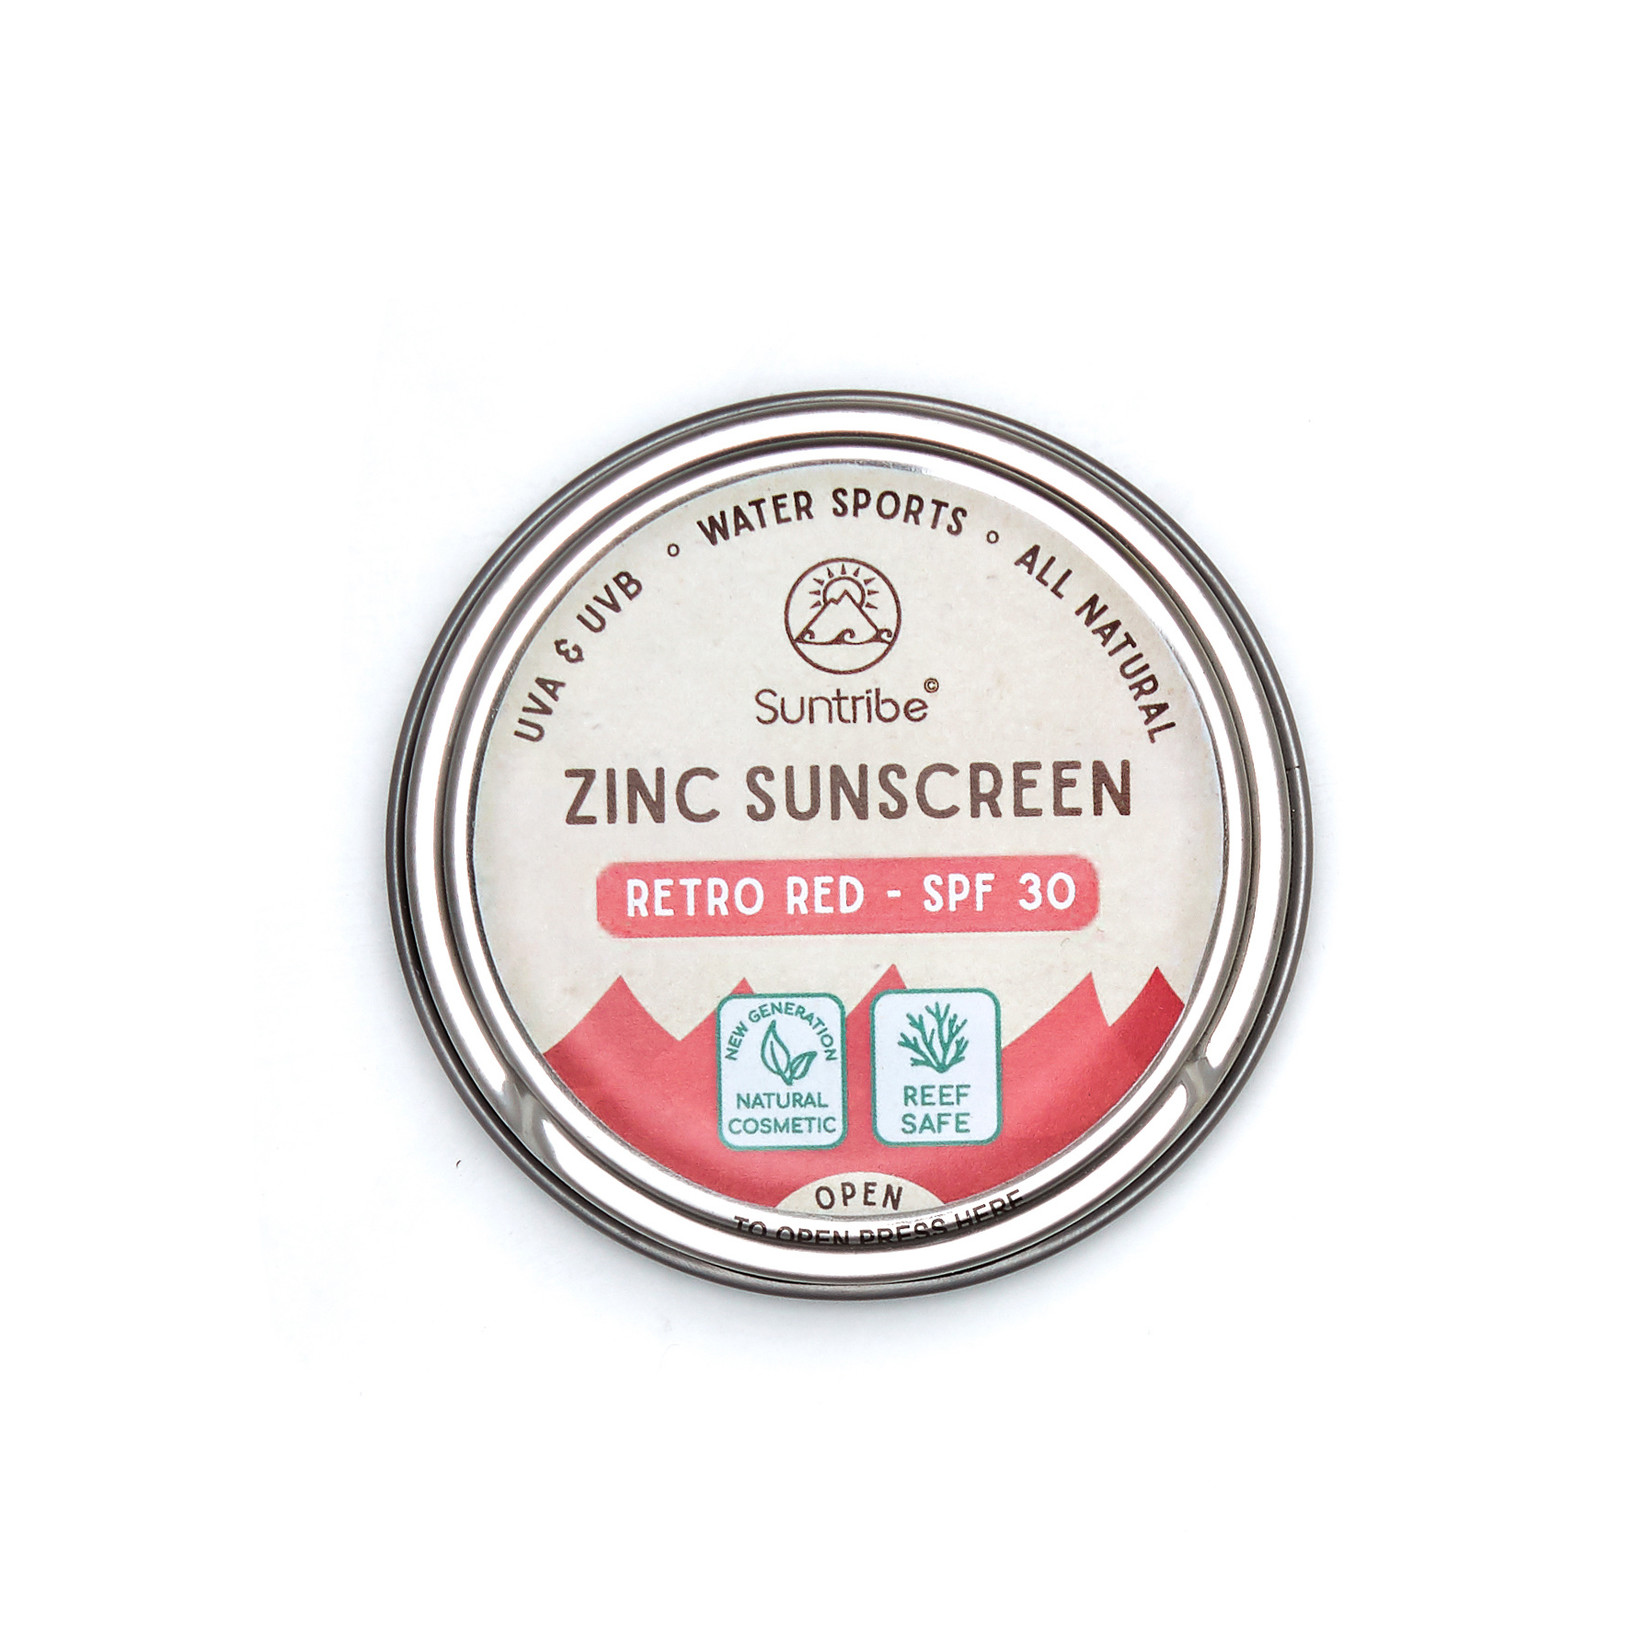 Suntribe Suntribe Zinc Sunscreen Tinted - Retro Red - SPF30